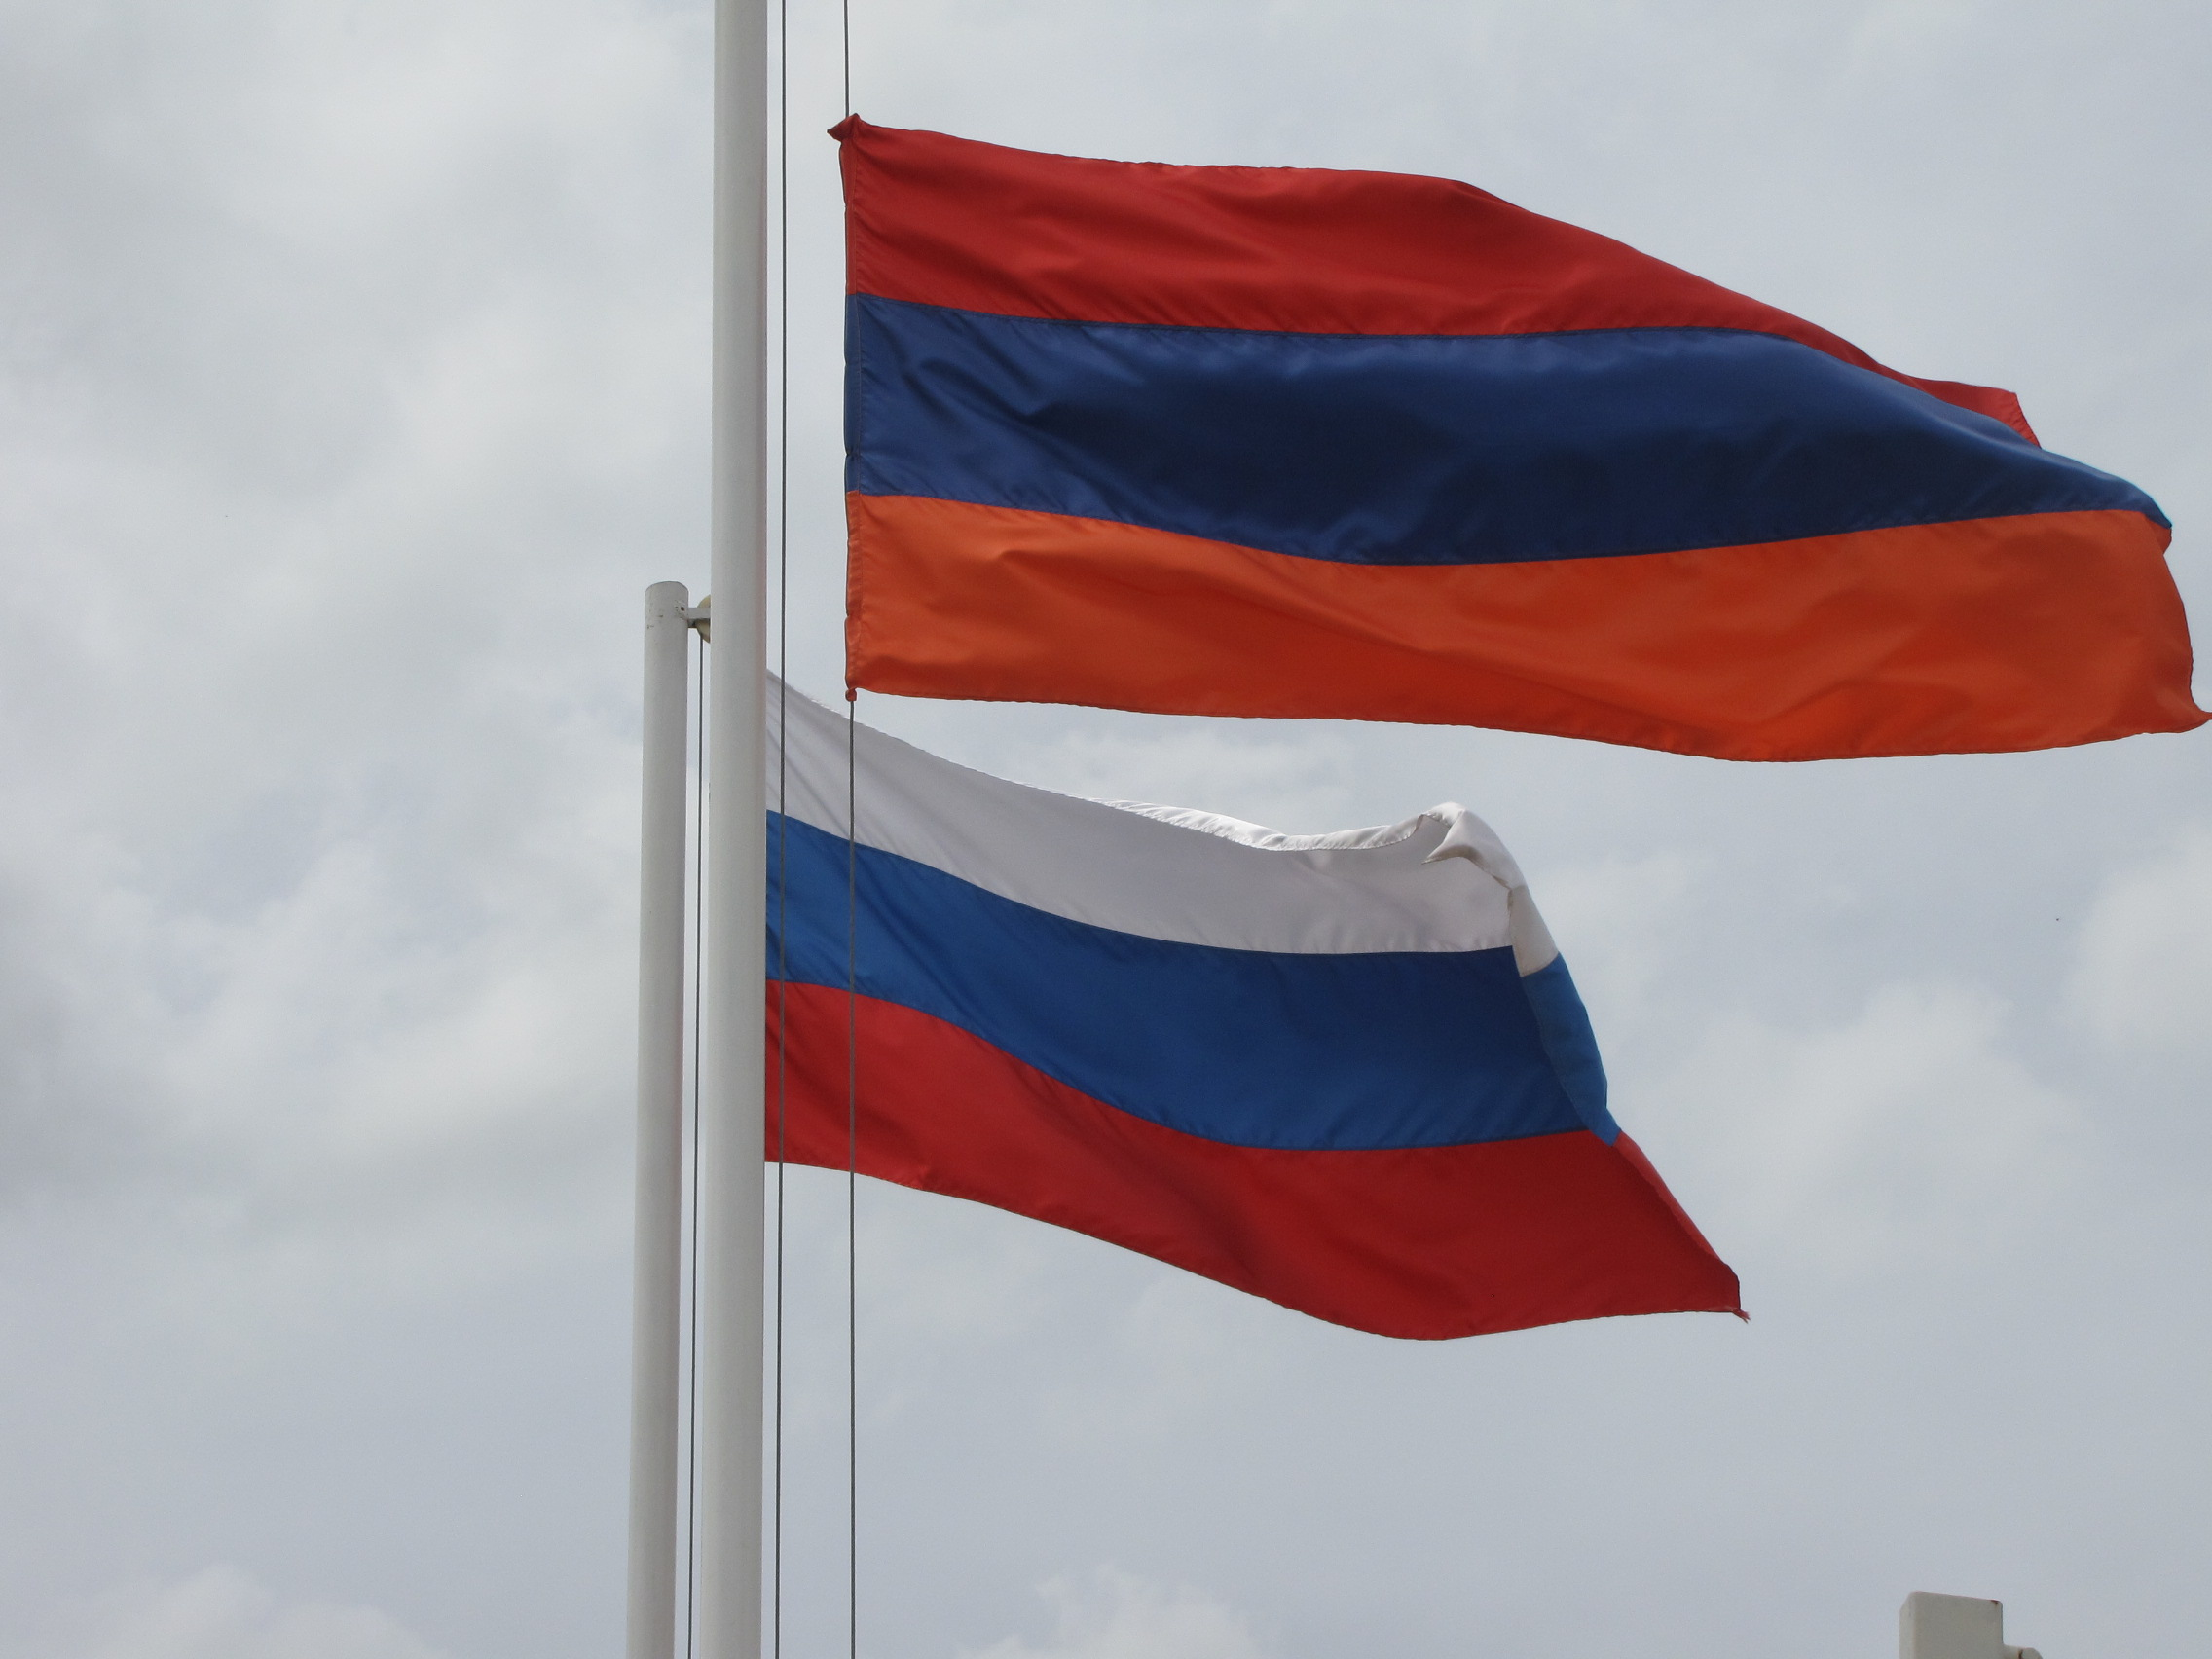 FileArmenian  Russian flags in Gyumrijpg  Wikimedia Commons